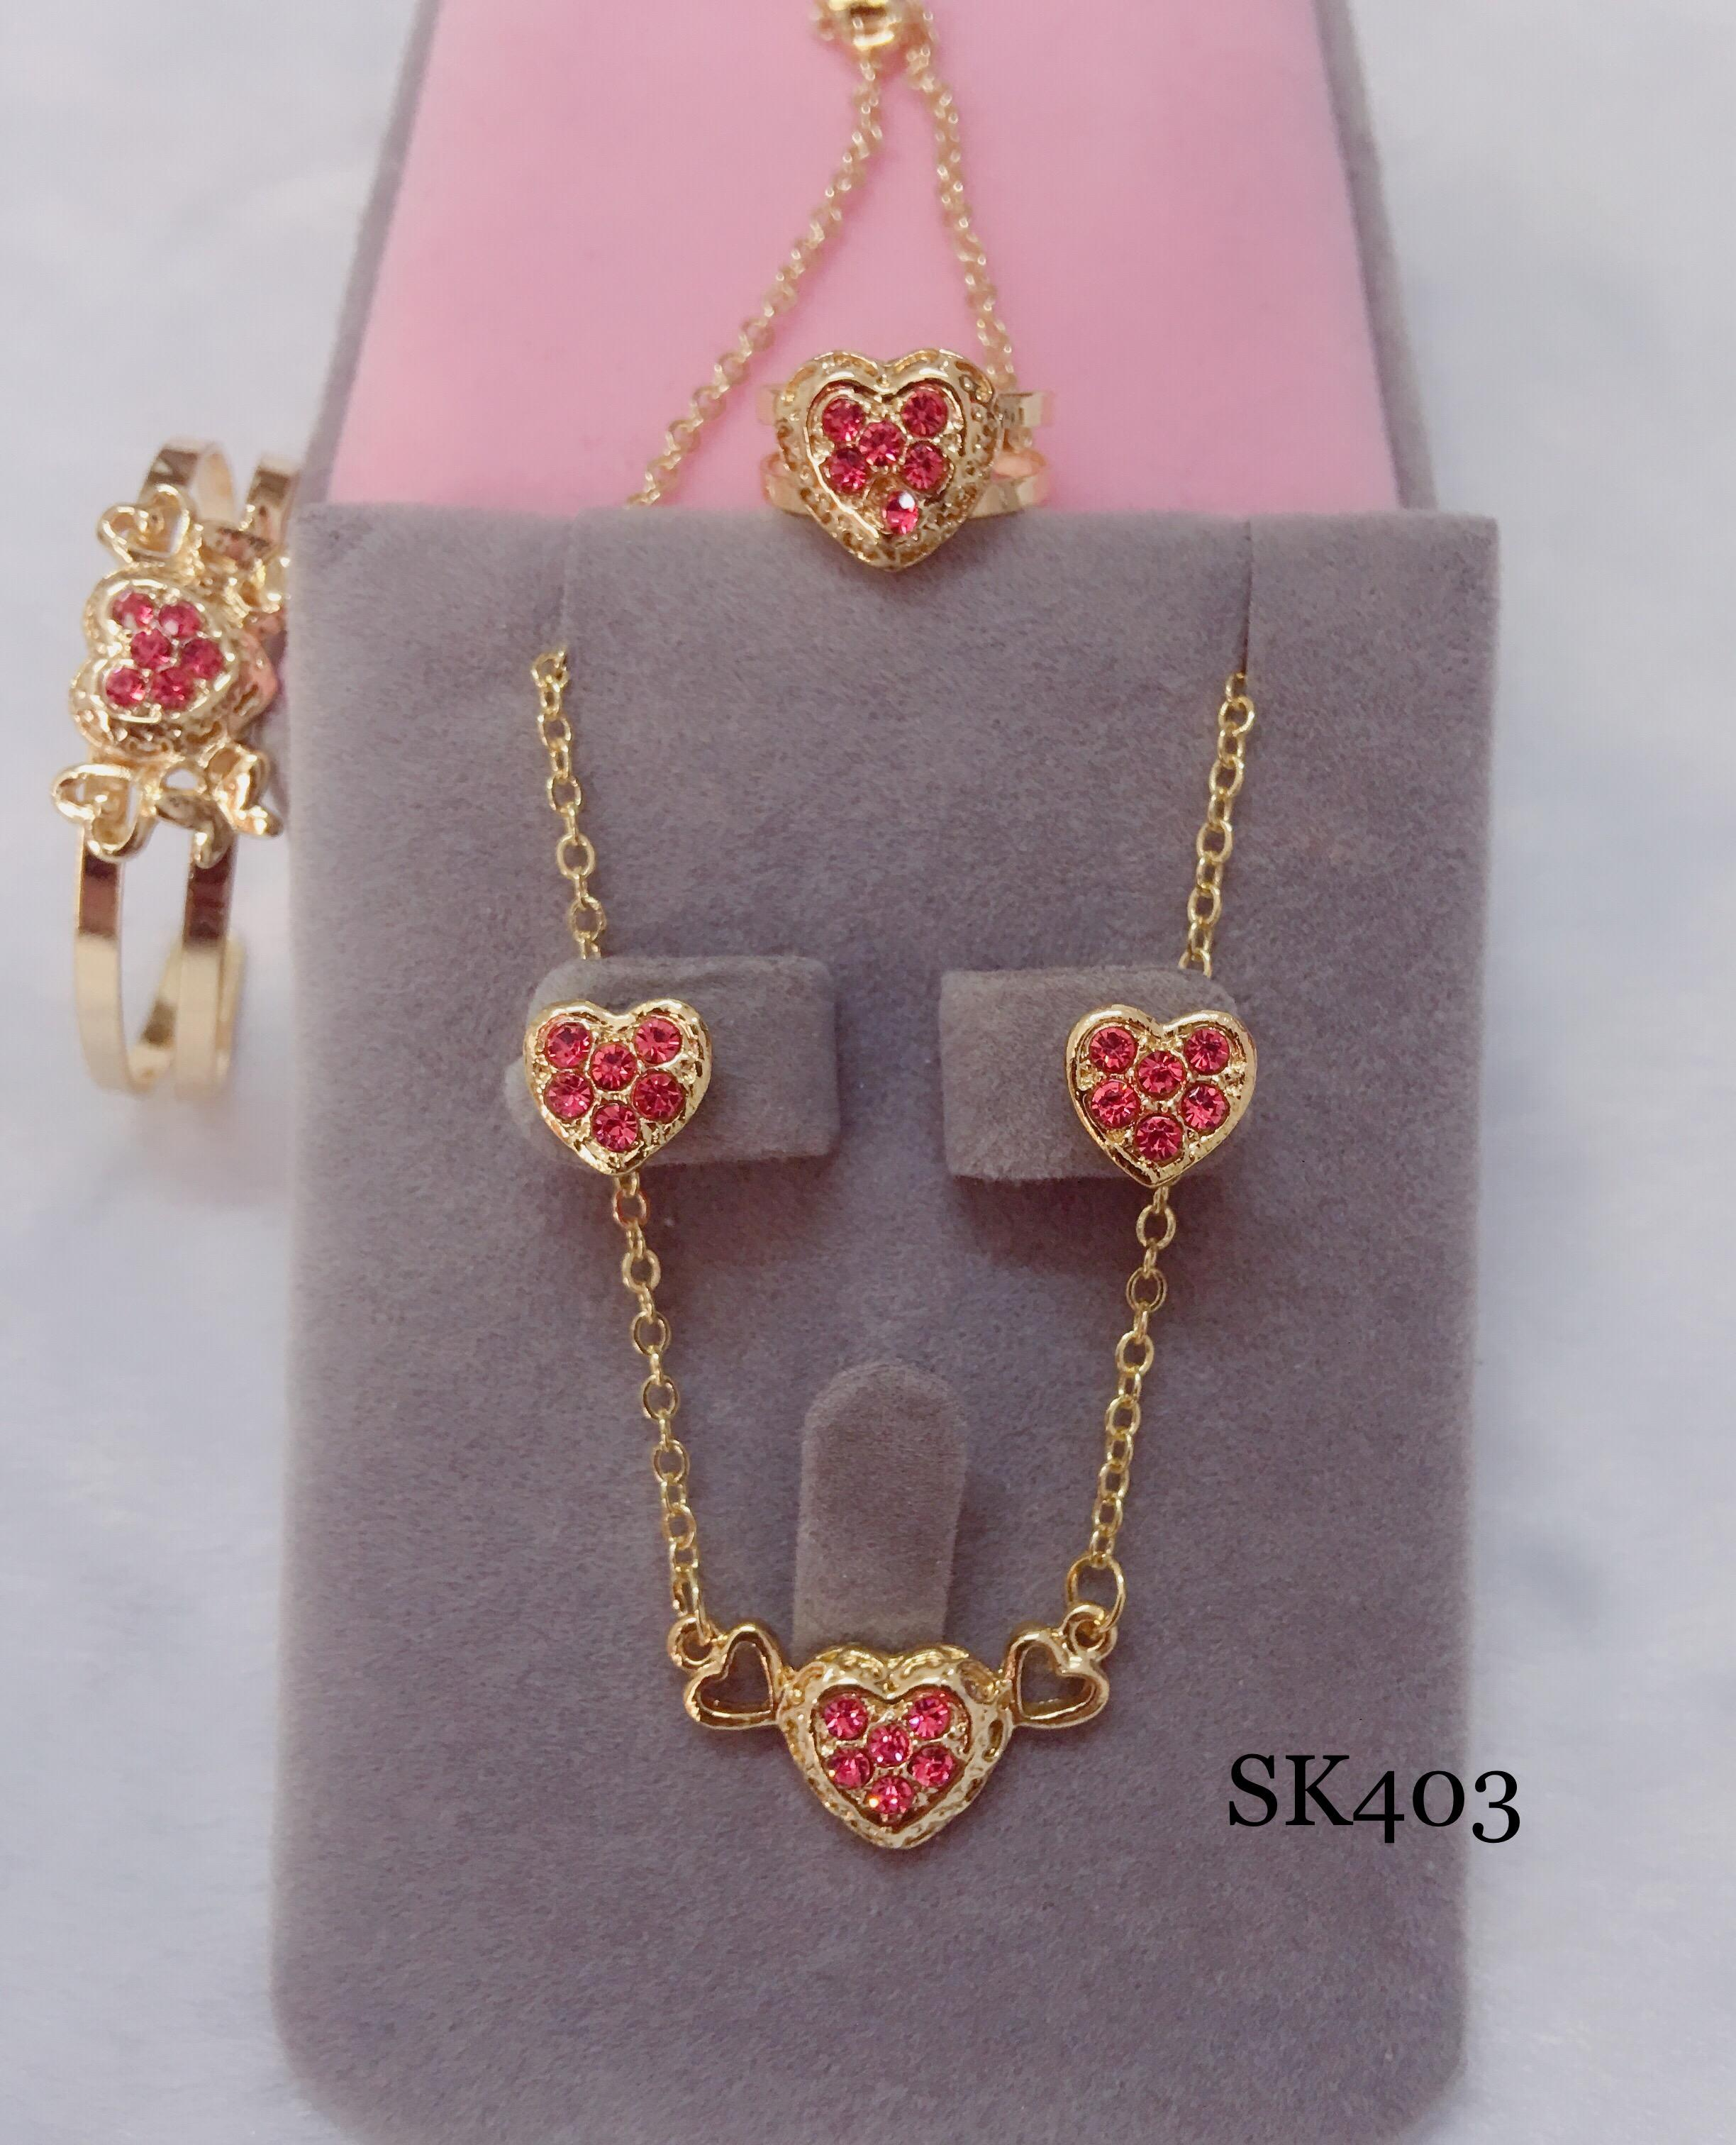 Sk403 18k Rose Gold Heart 4 In 1 Set For Kids By Miss M Shop.